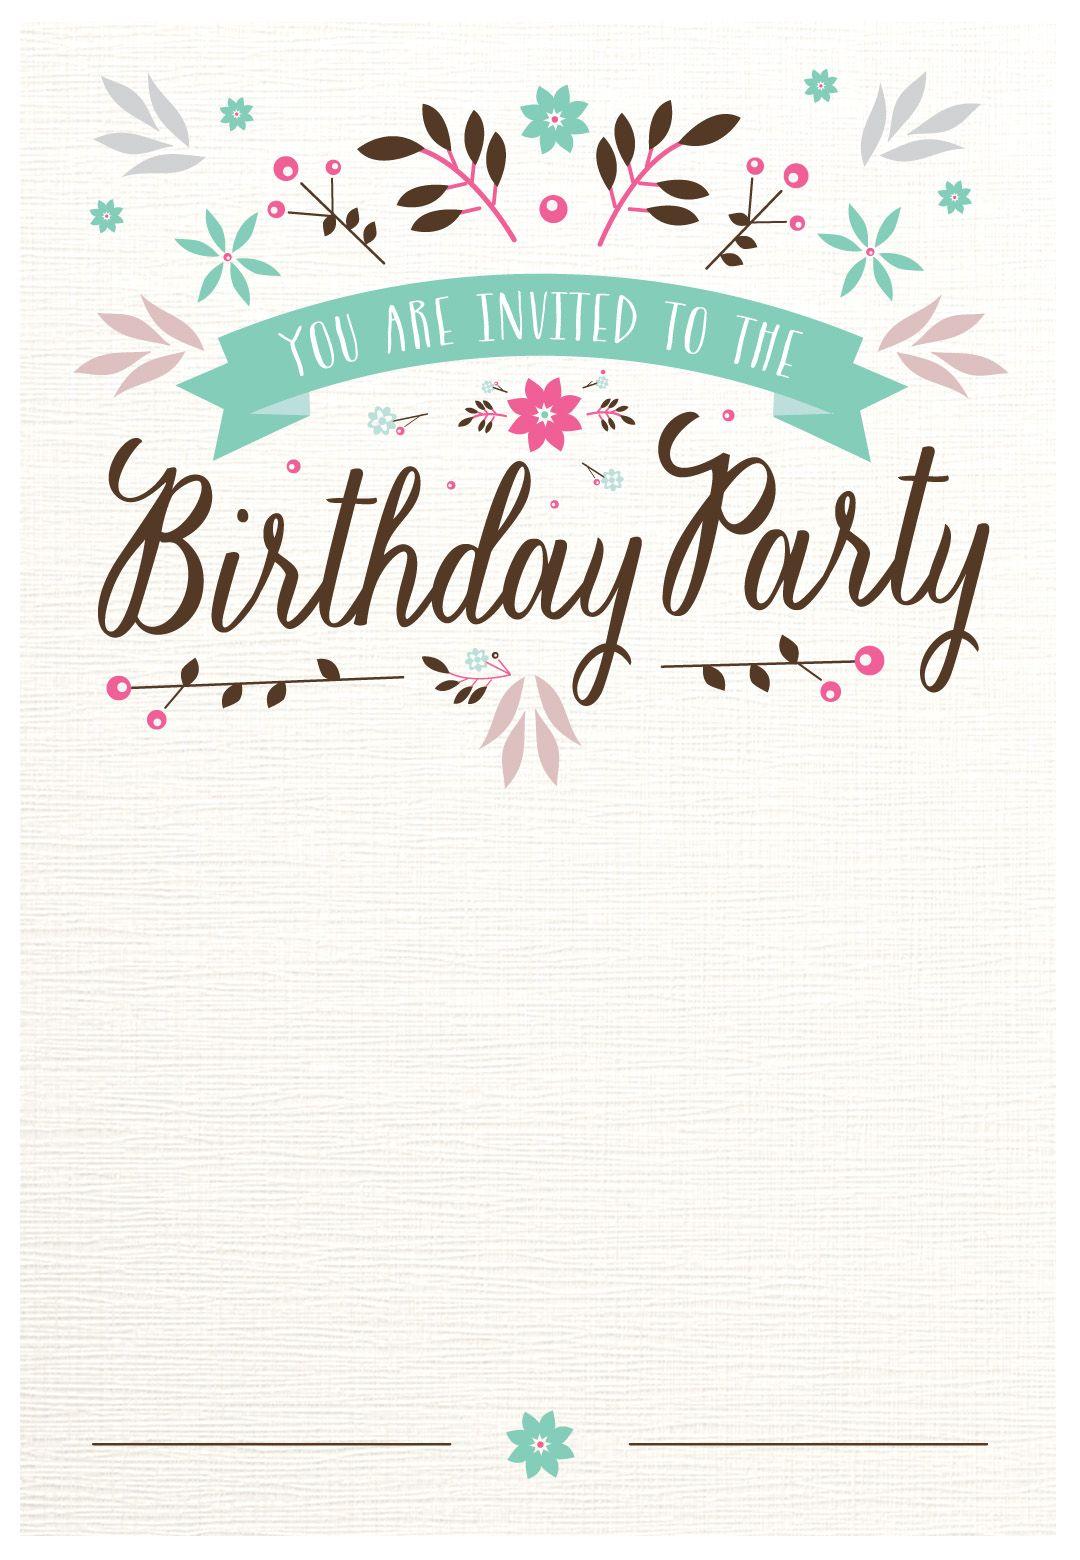 Free Printable Birthday Invitation Flat Floral Greeti Birthday Party Invitations Printable Birthday Invitation Card Template Printable Birthday Invitations